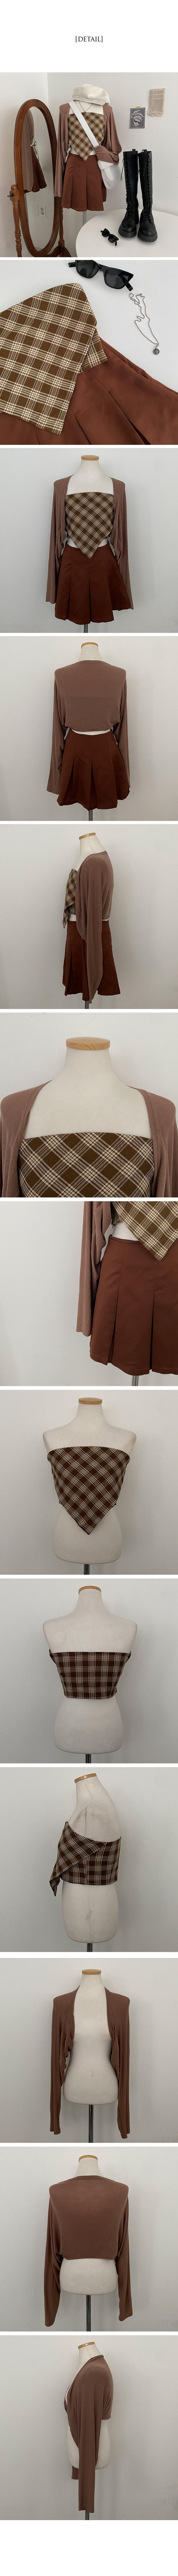 Weekend Bolero Top Skirt 3pc Set